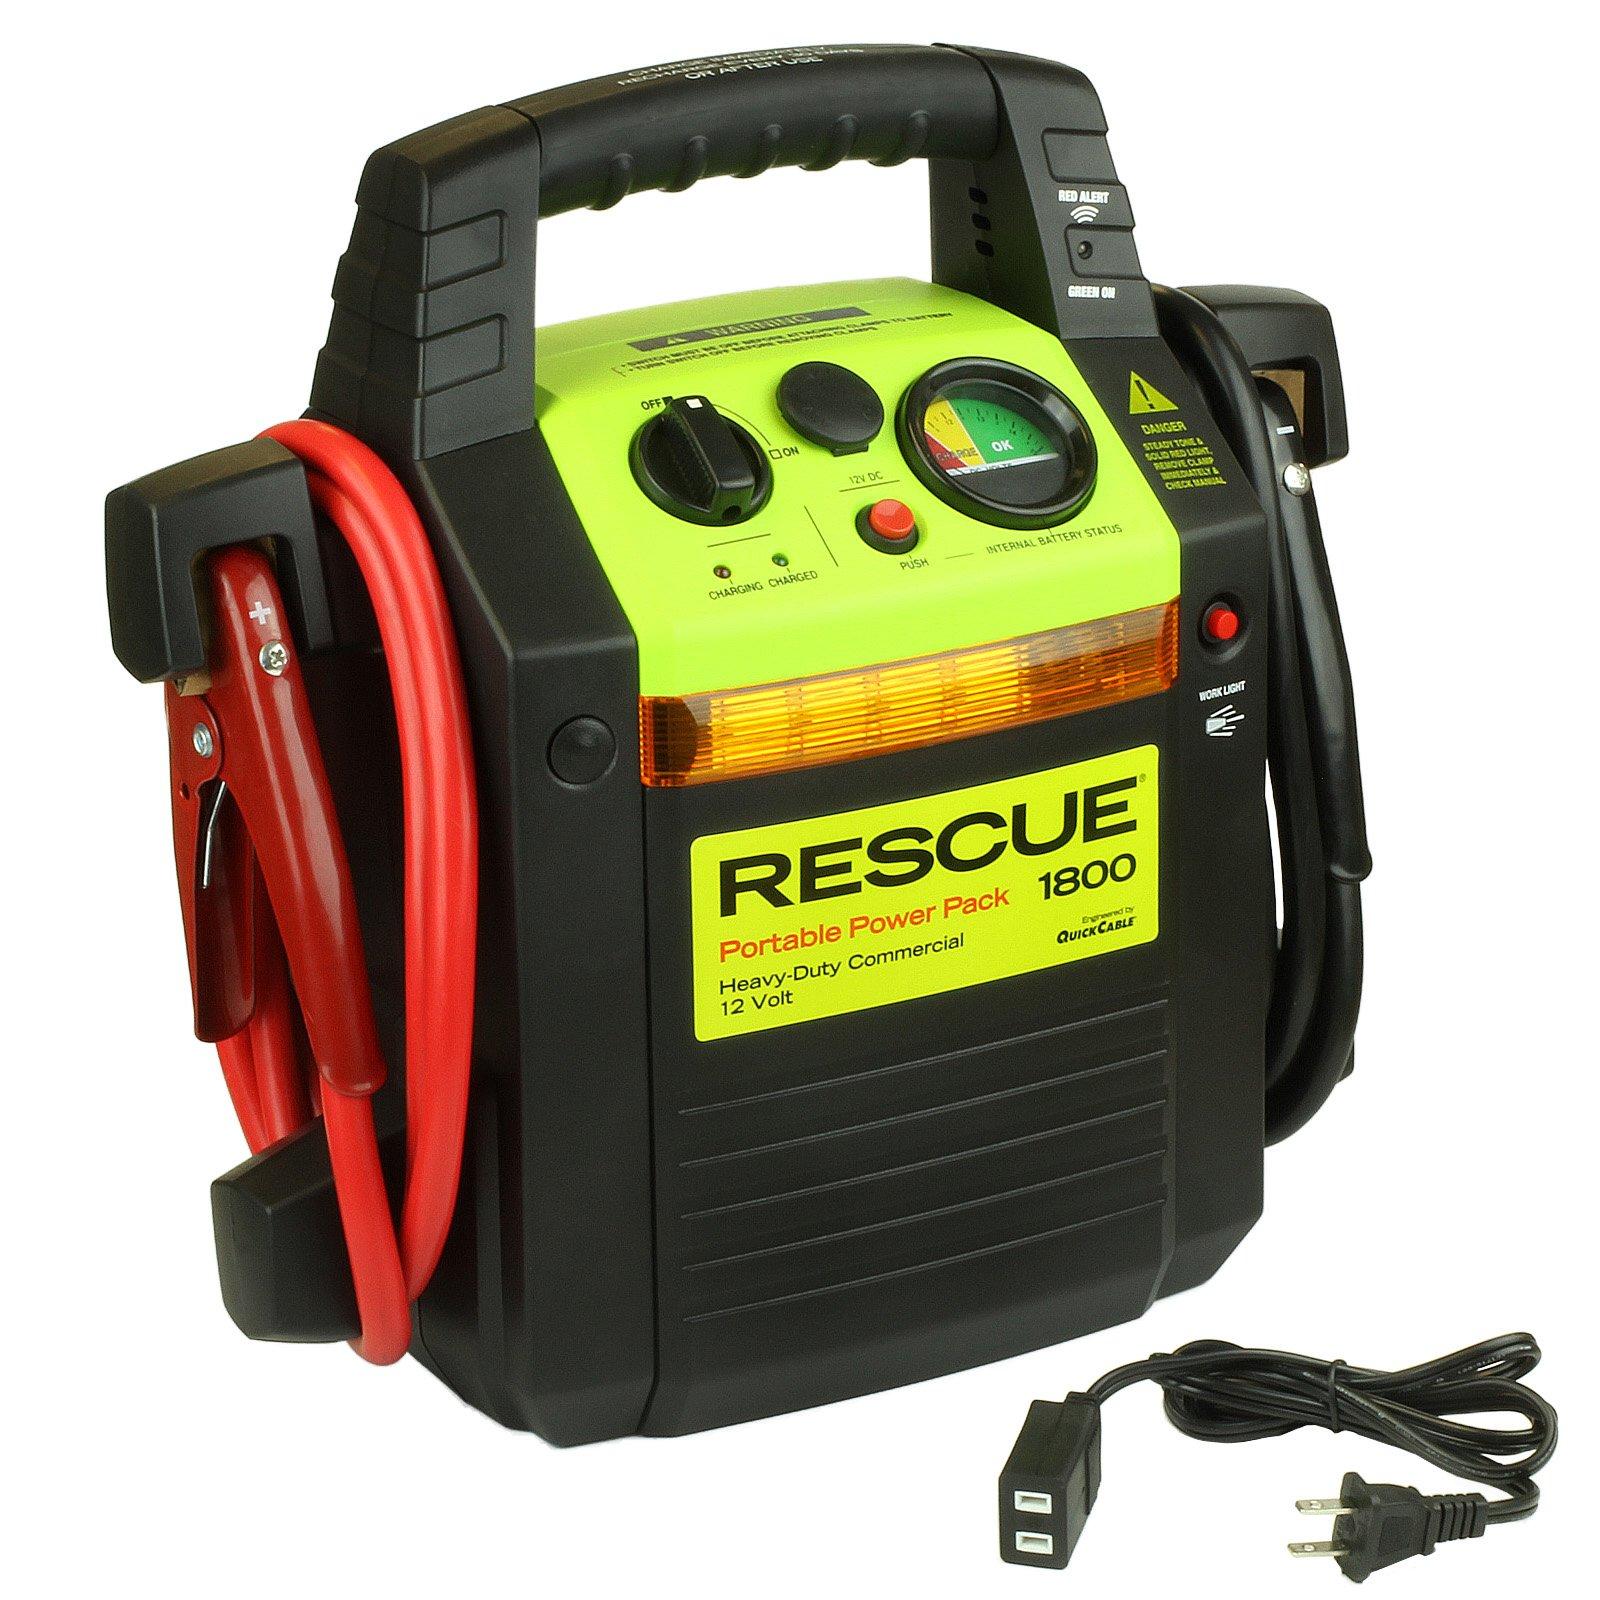 QuickCable Rescue Jump Pack 1800 - 12 Volt Dual Battery: BatteryMart.com